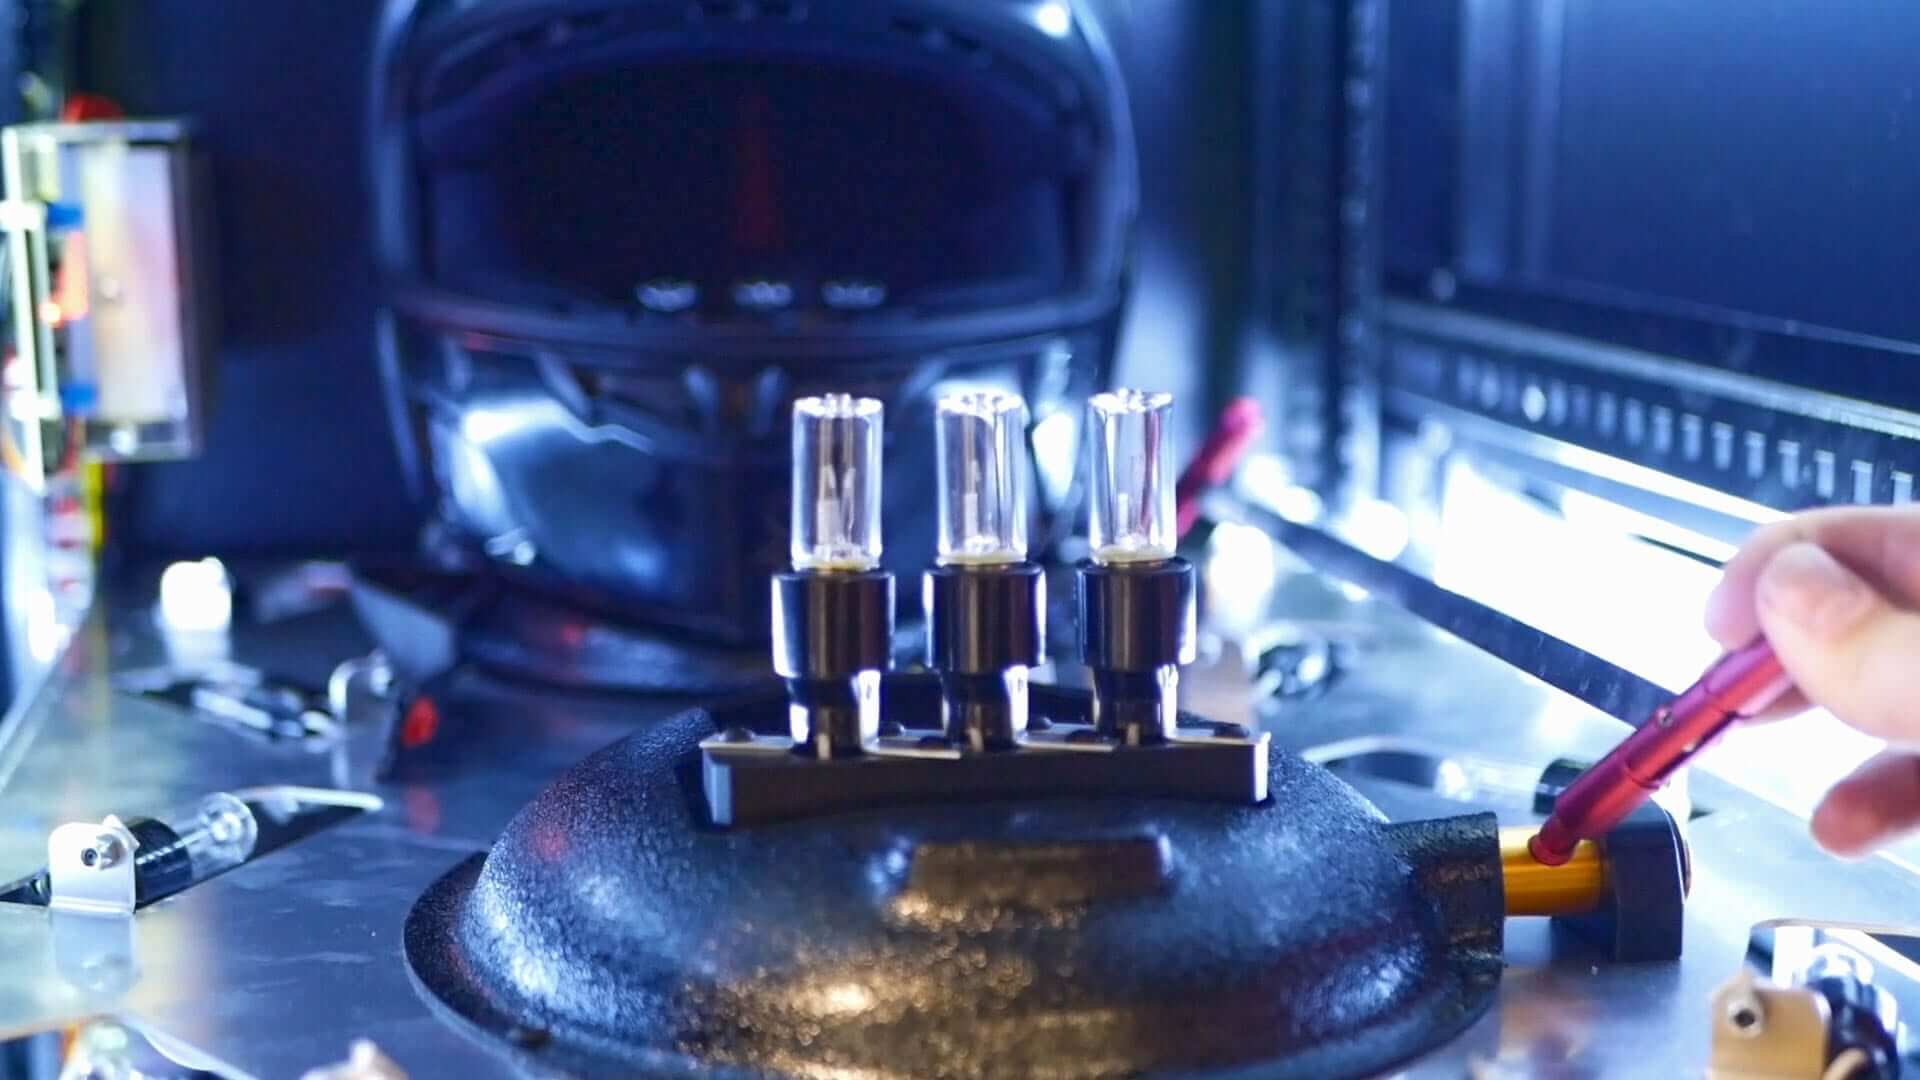 saniboxx4 - Cutting Edge Technology Making Return To Karting Safer Than Ever